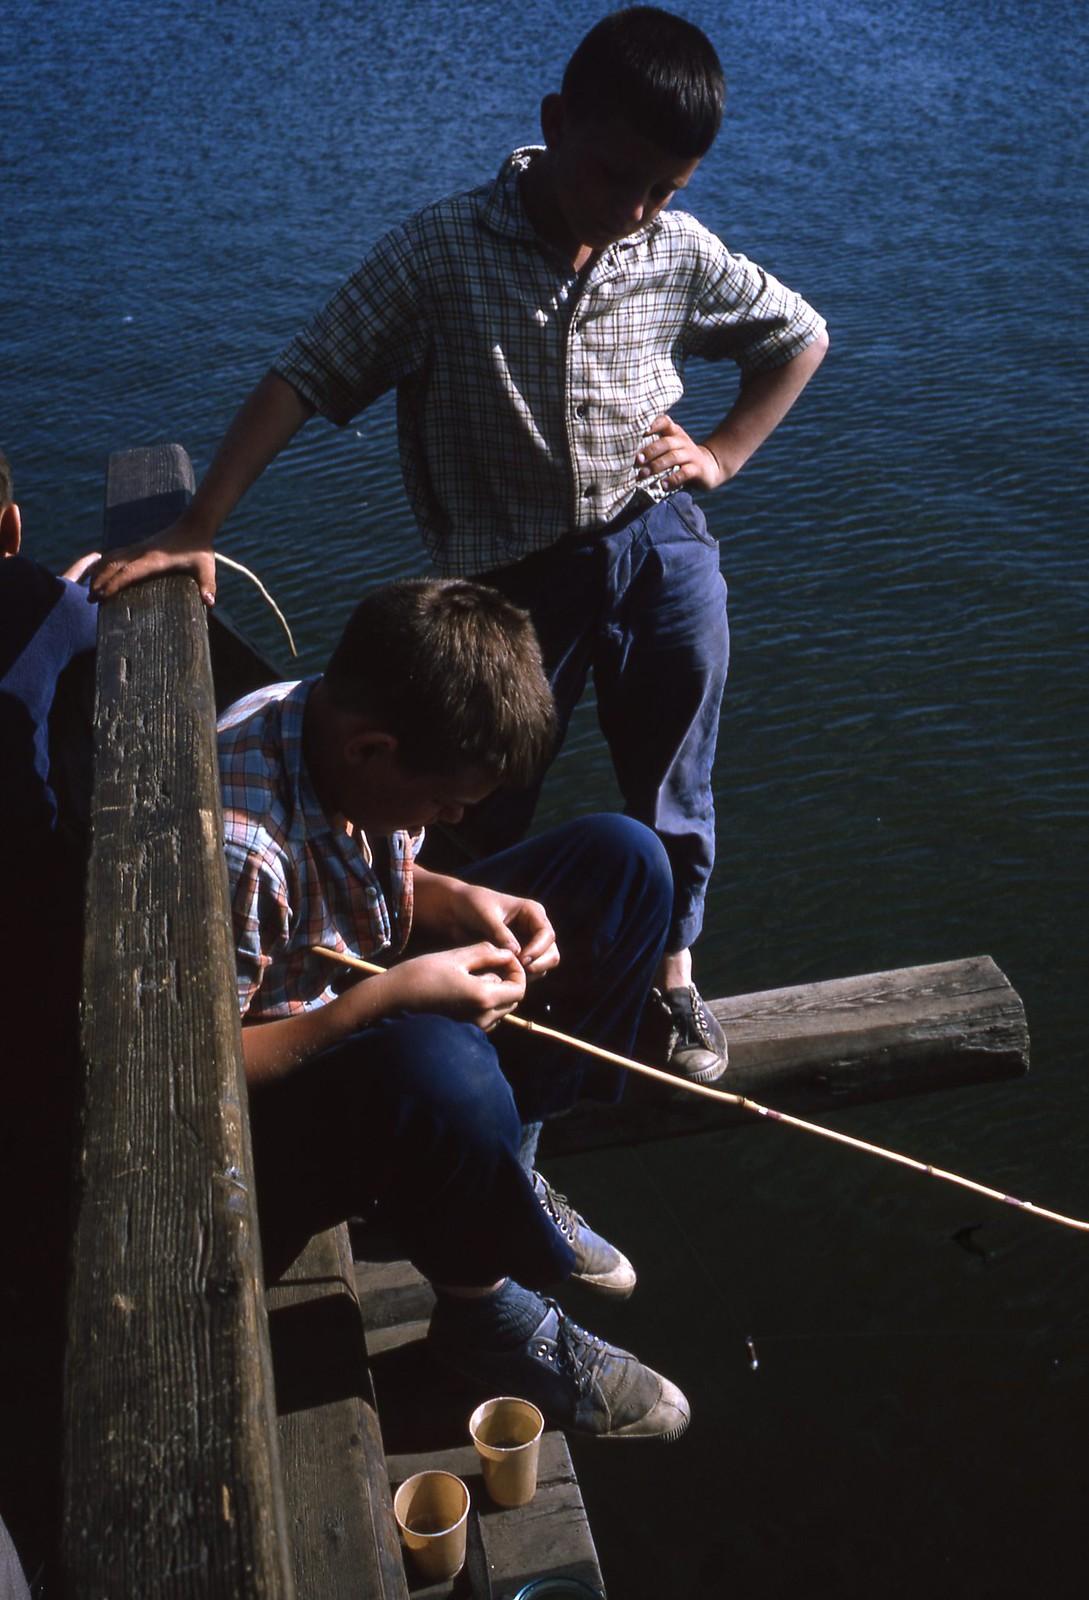 hammond-MA10-Ostankino-people-sunbathing-and-fishing-003